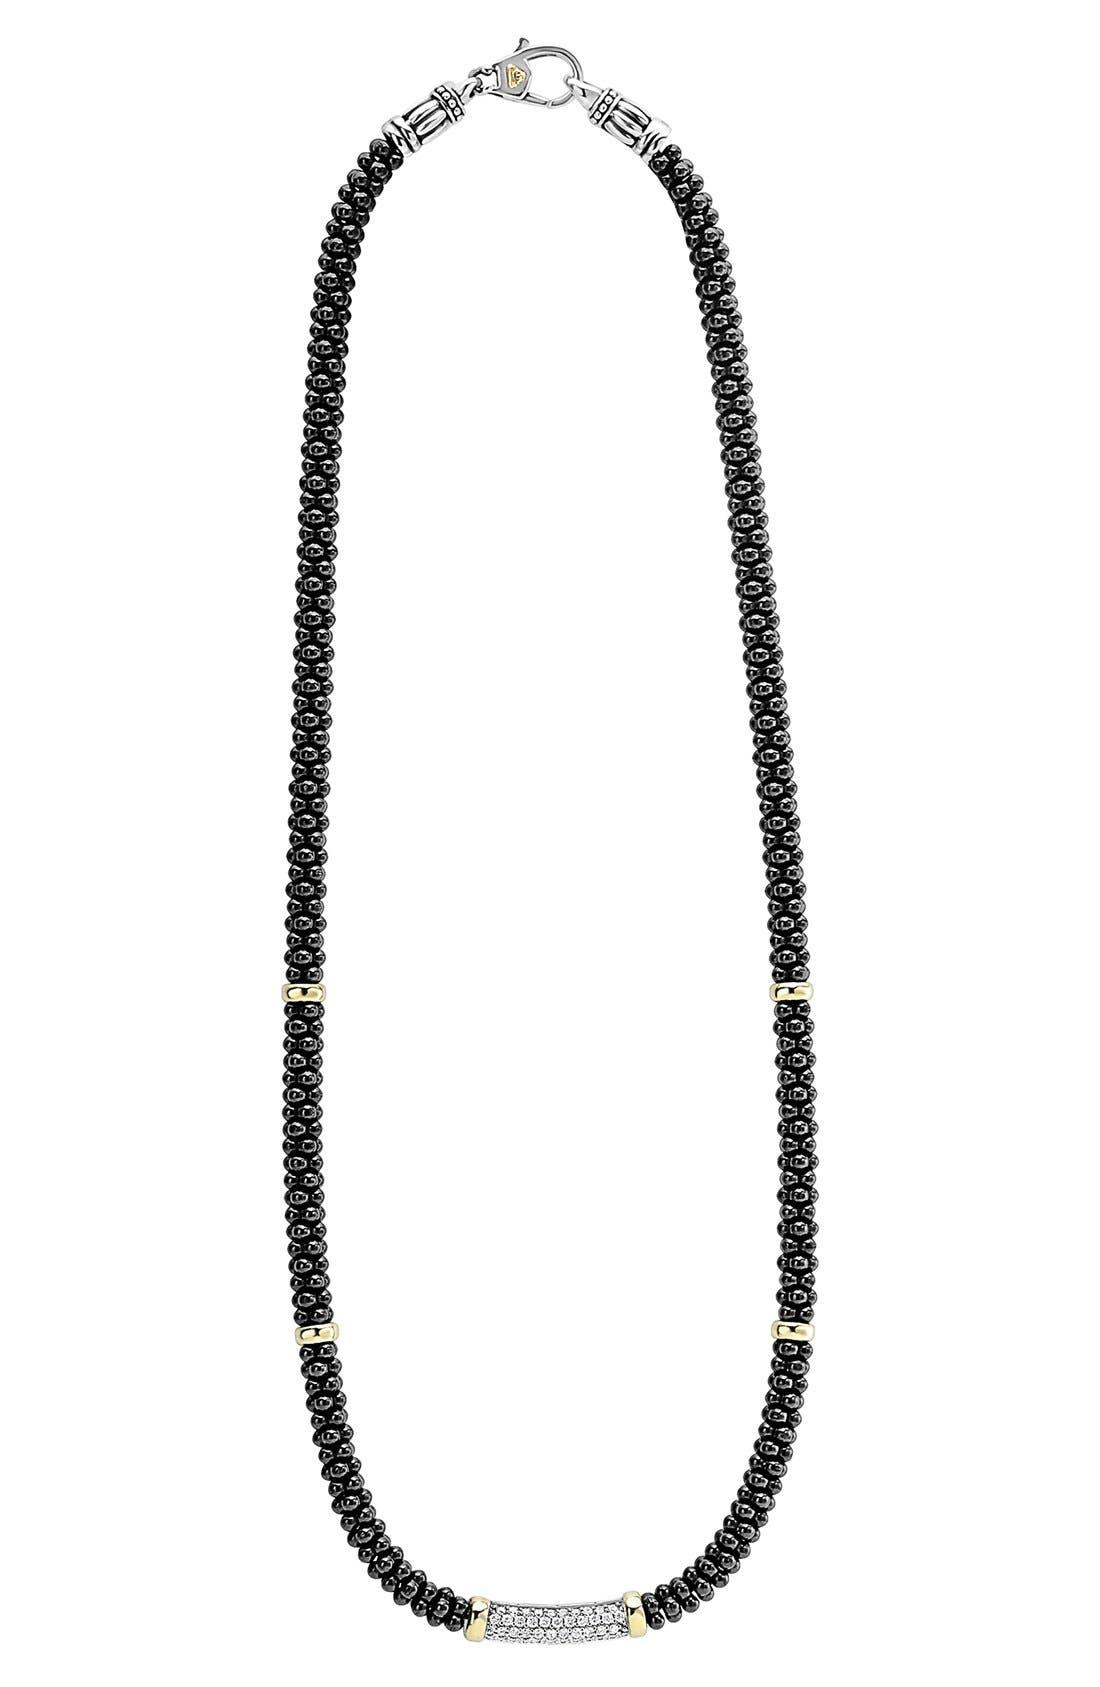 'Black Caviar' 5mm Beaded DiamondBar Necklace,                             Alternate thumbnail 3, color,                             BLACK CAVIAR/ GOLD